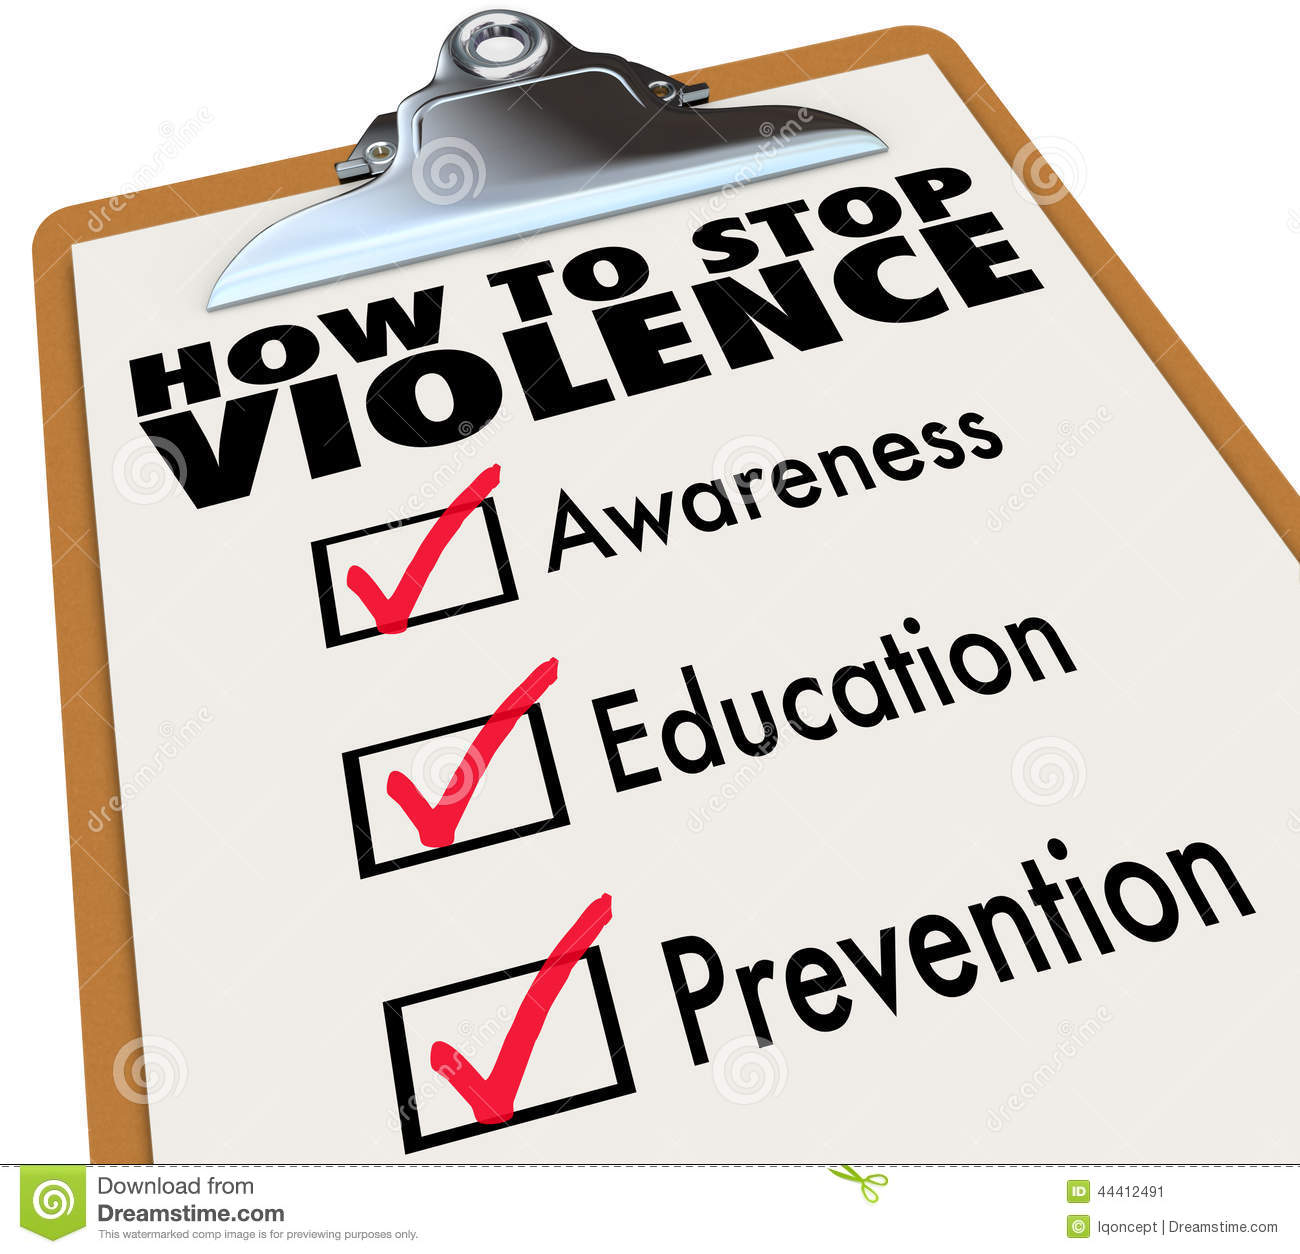 Prevention clipart #9